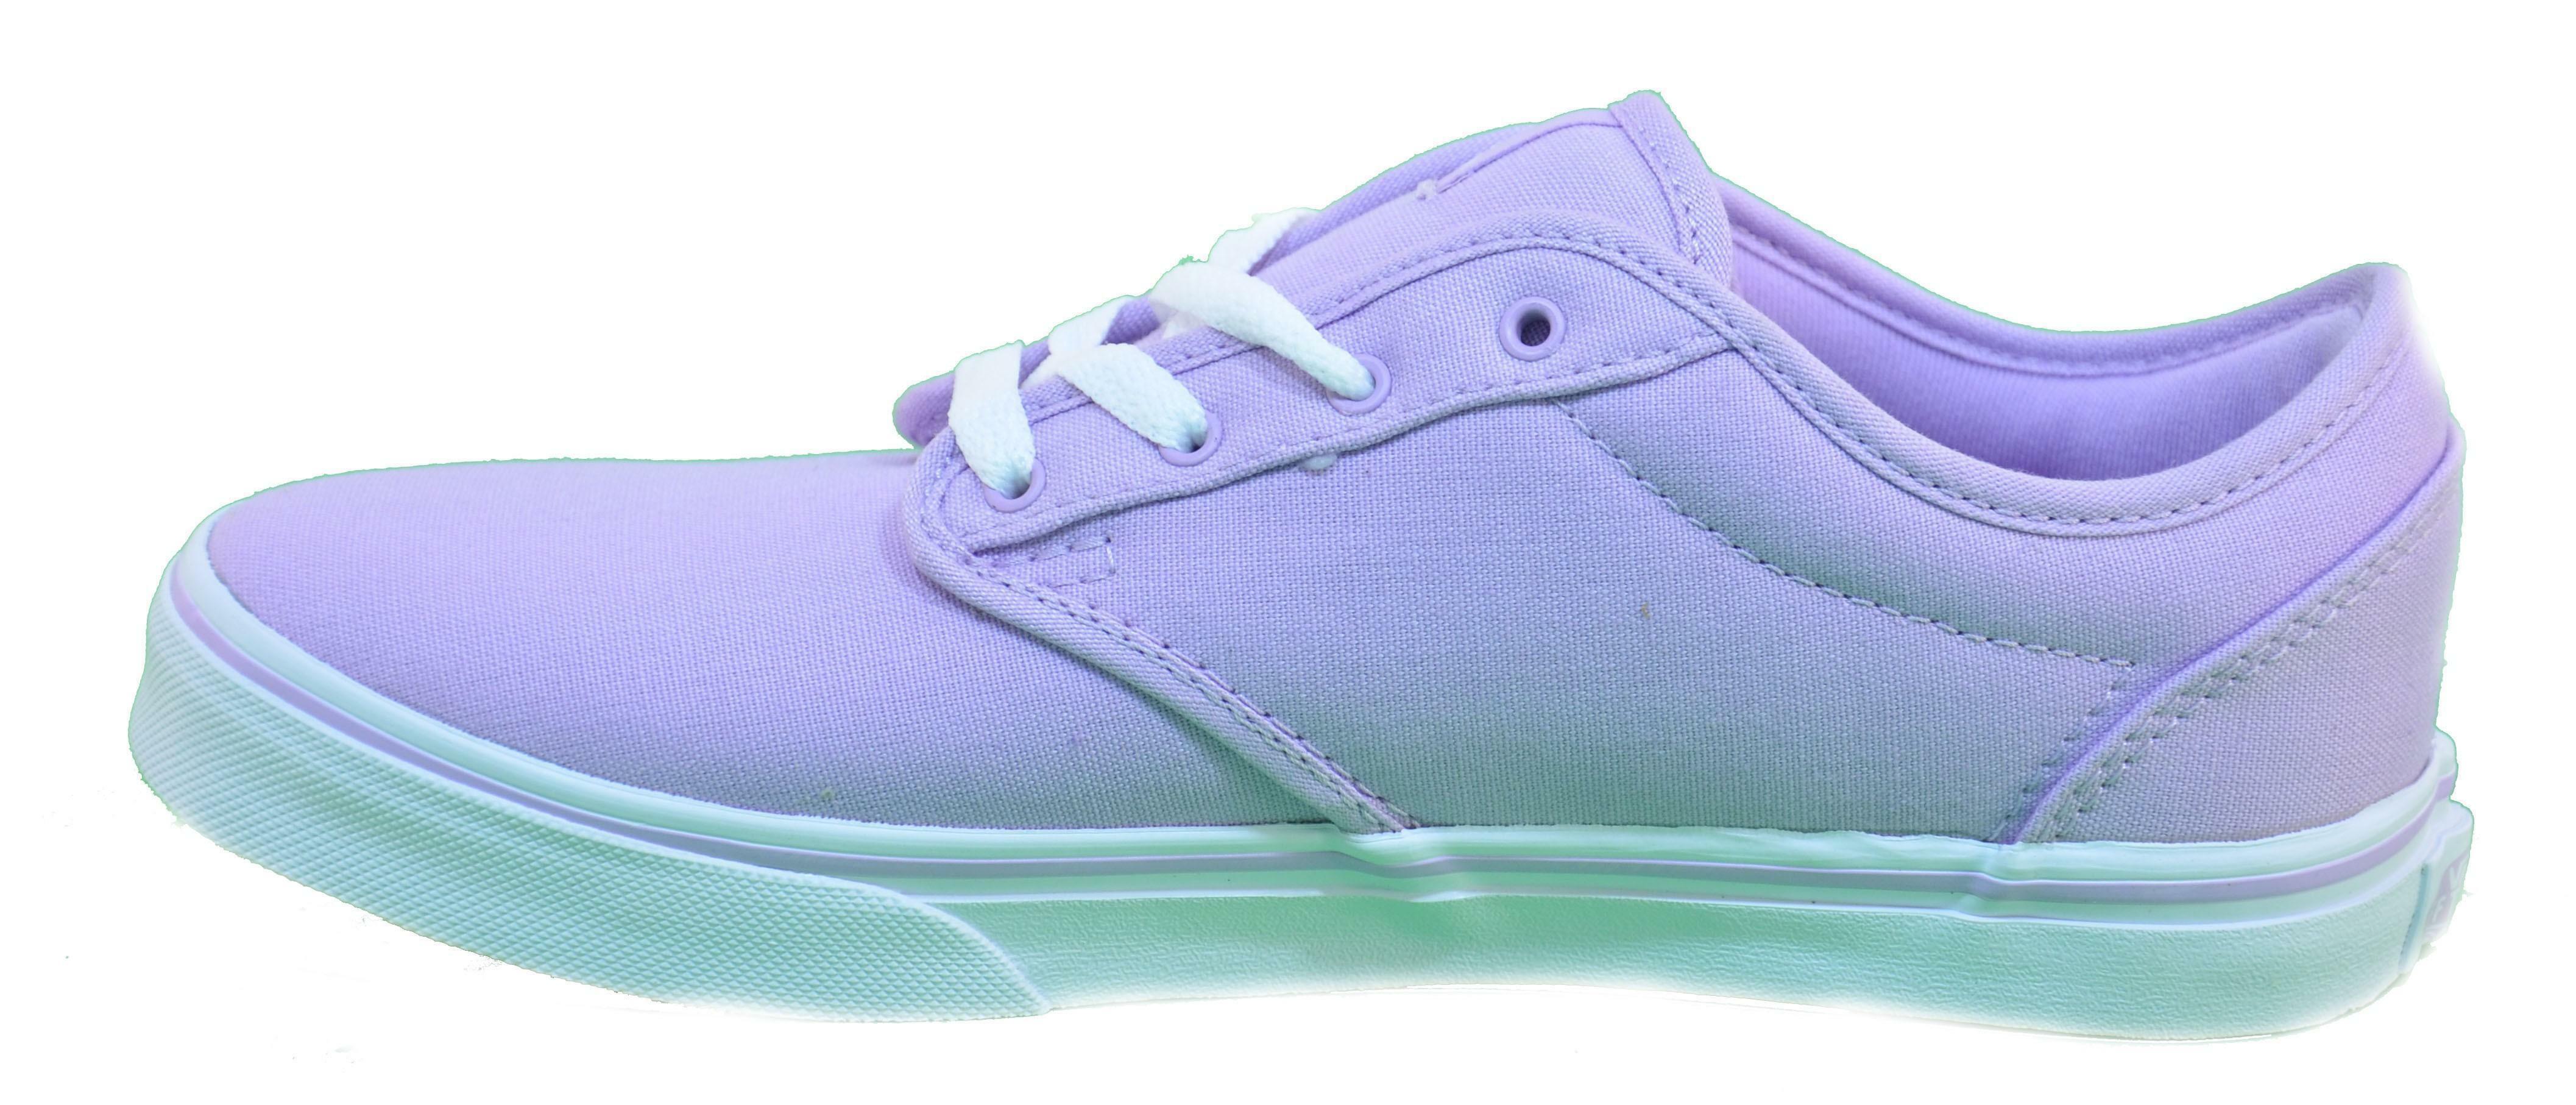 vans vans atwood scarpe bambina viola tela zusf9h